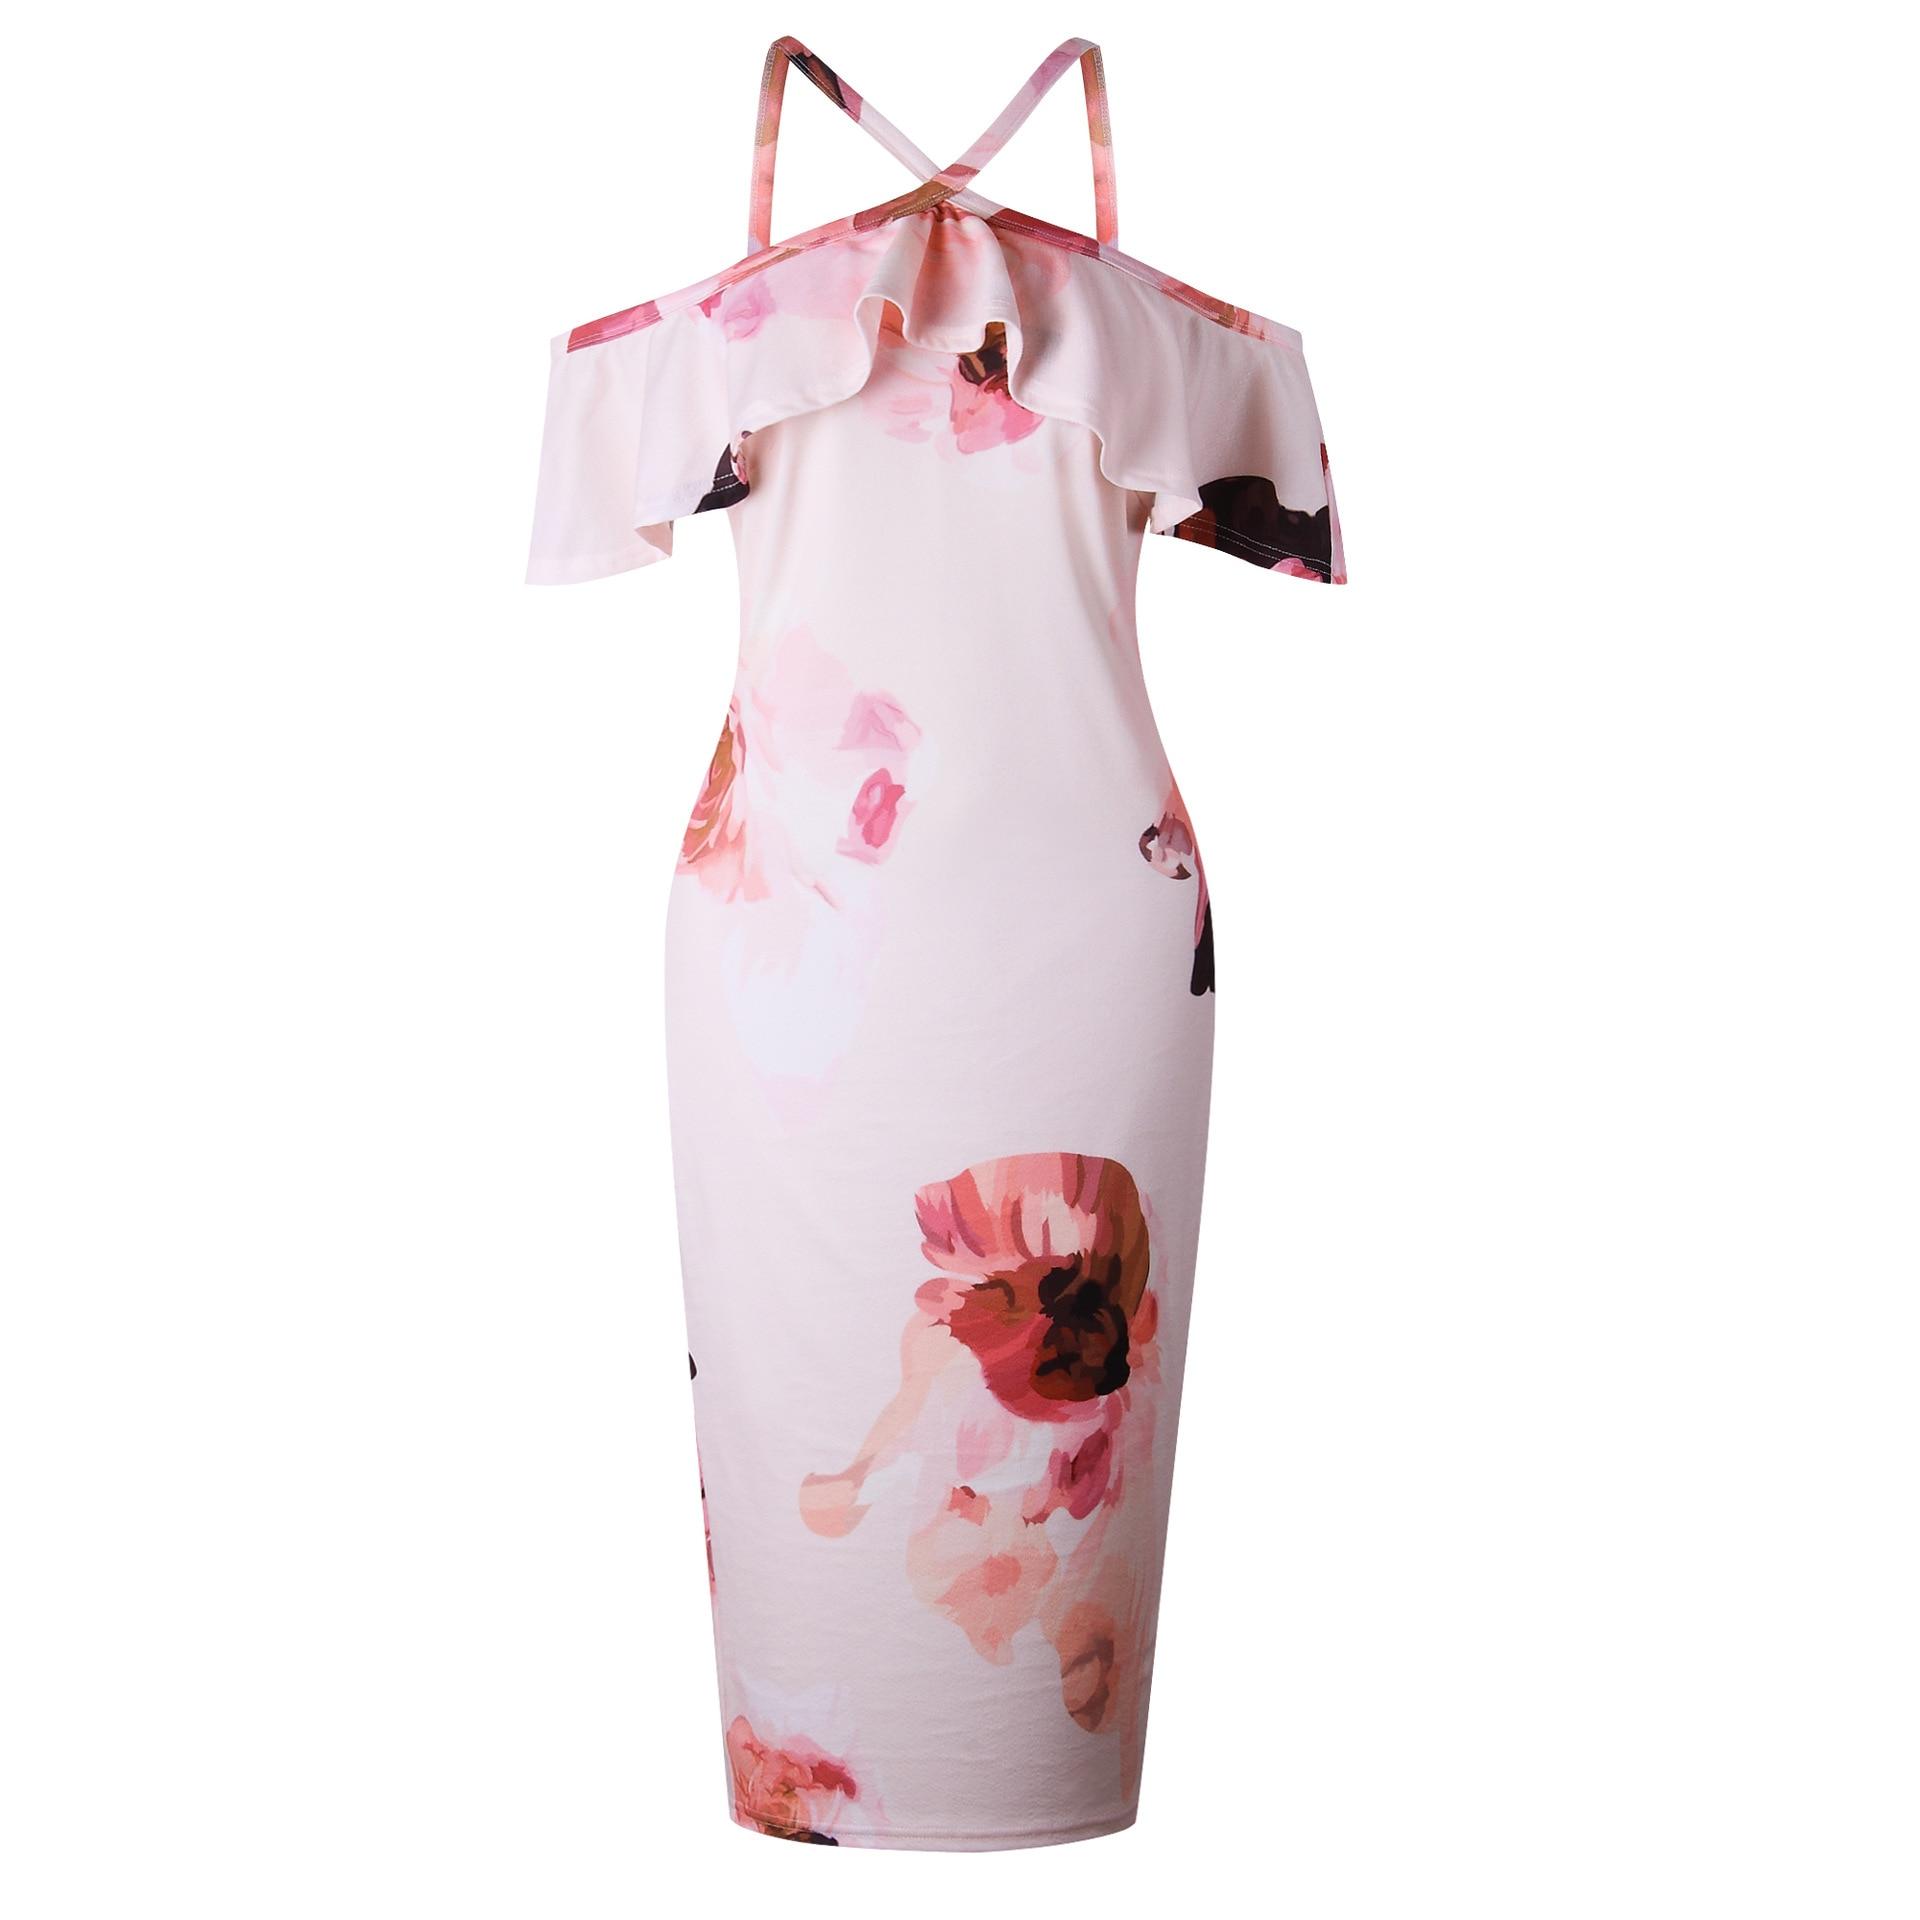 LOGAMI Off Shoulder Retro Floral Print Bodycon Dreess Women Sexy Summer Dress Sexy Midi Wrap Party Dresses